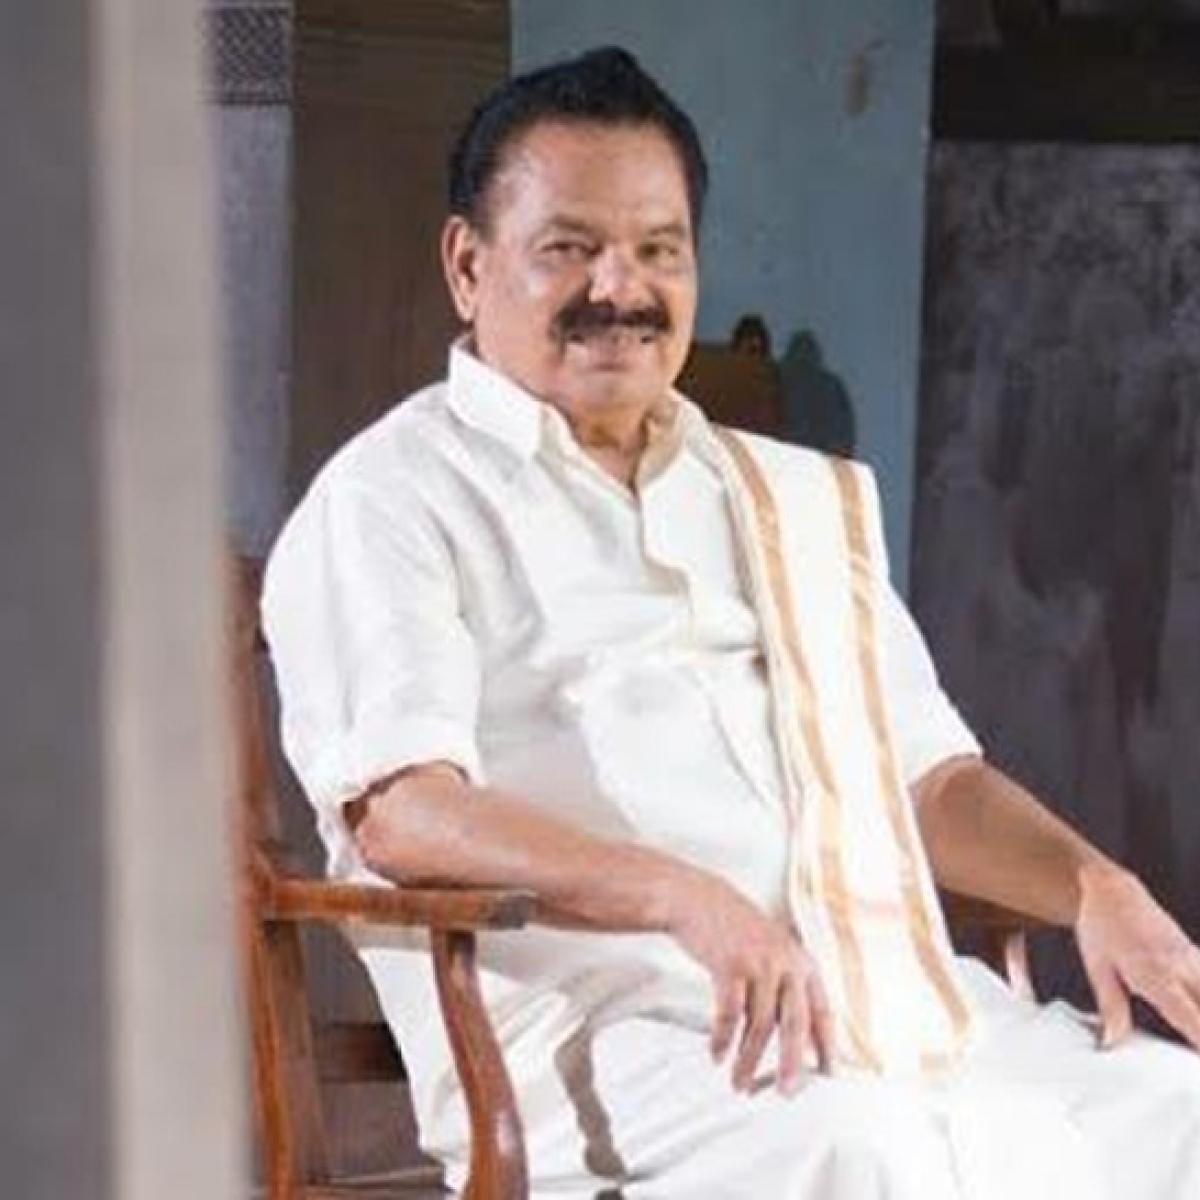 Former Karnataka minister and senior JDS leader Amarnath Shetty passes away at 80